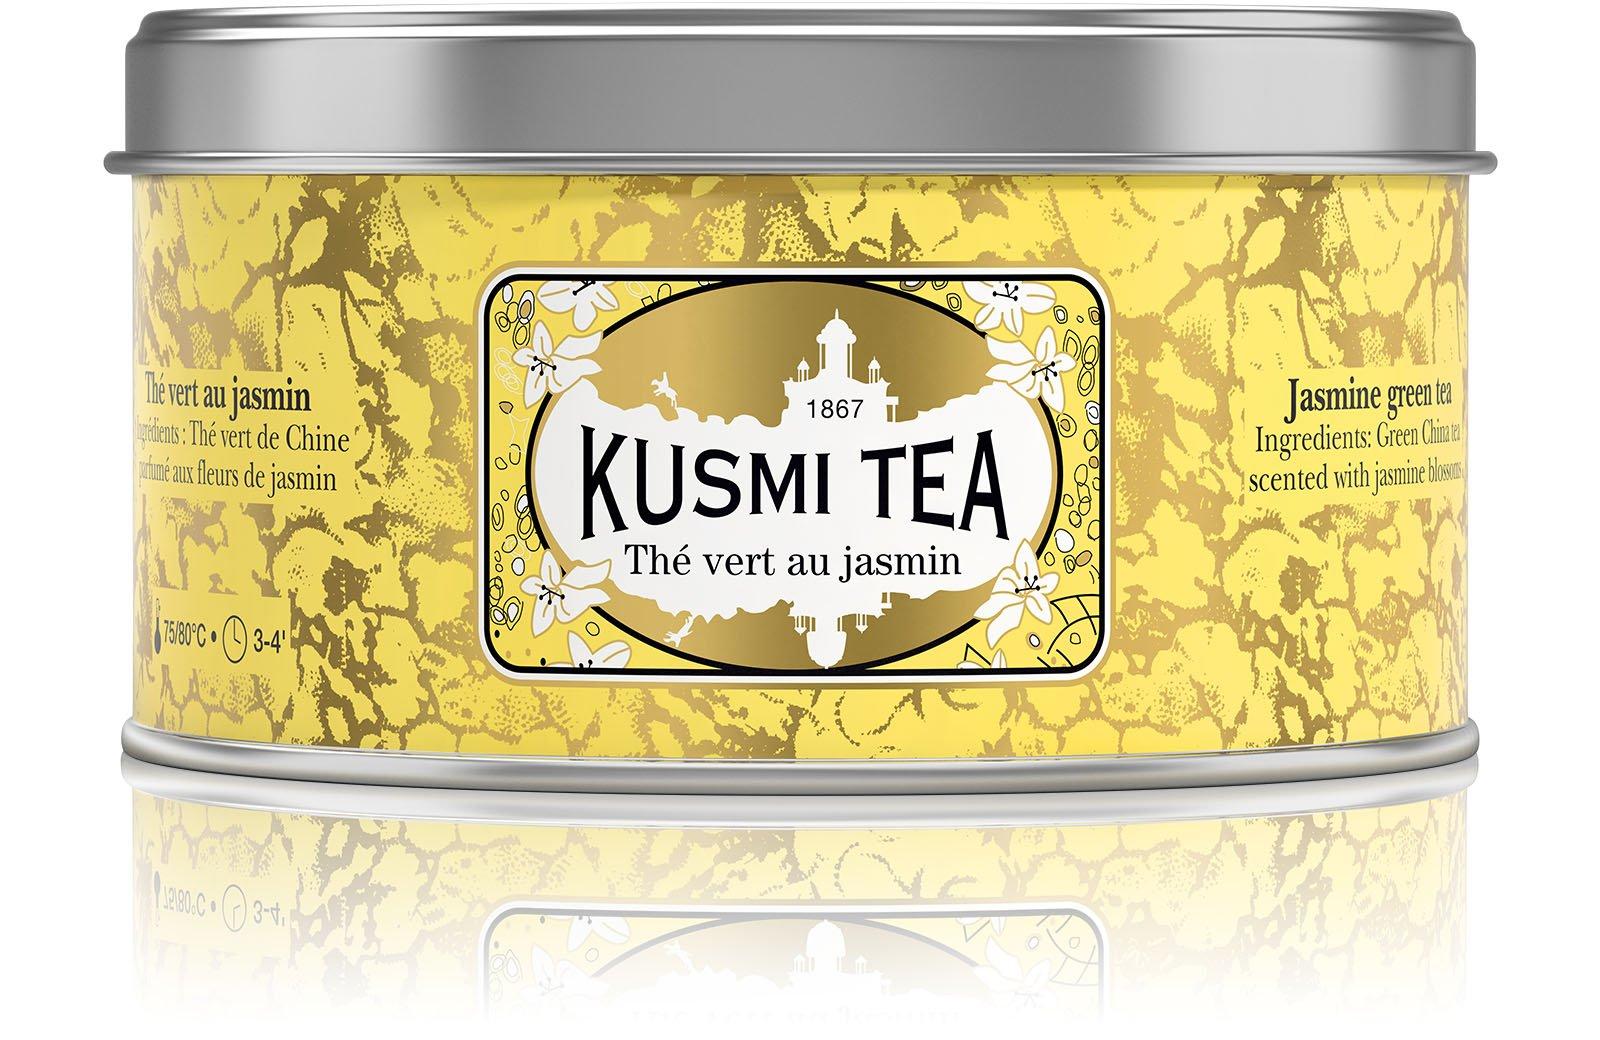 Kusmi Tea - Jasmine Green Tea - Green Tea Blend Flavored with Jasmine Blossoms - 4.4oz of All Natural, Premium Quality, Loose Leaf Jasmine Green Tea in Eco-Friendly Metal Tin (50 Servings)